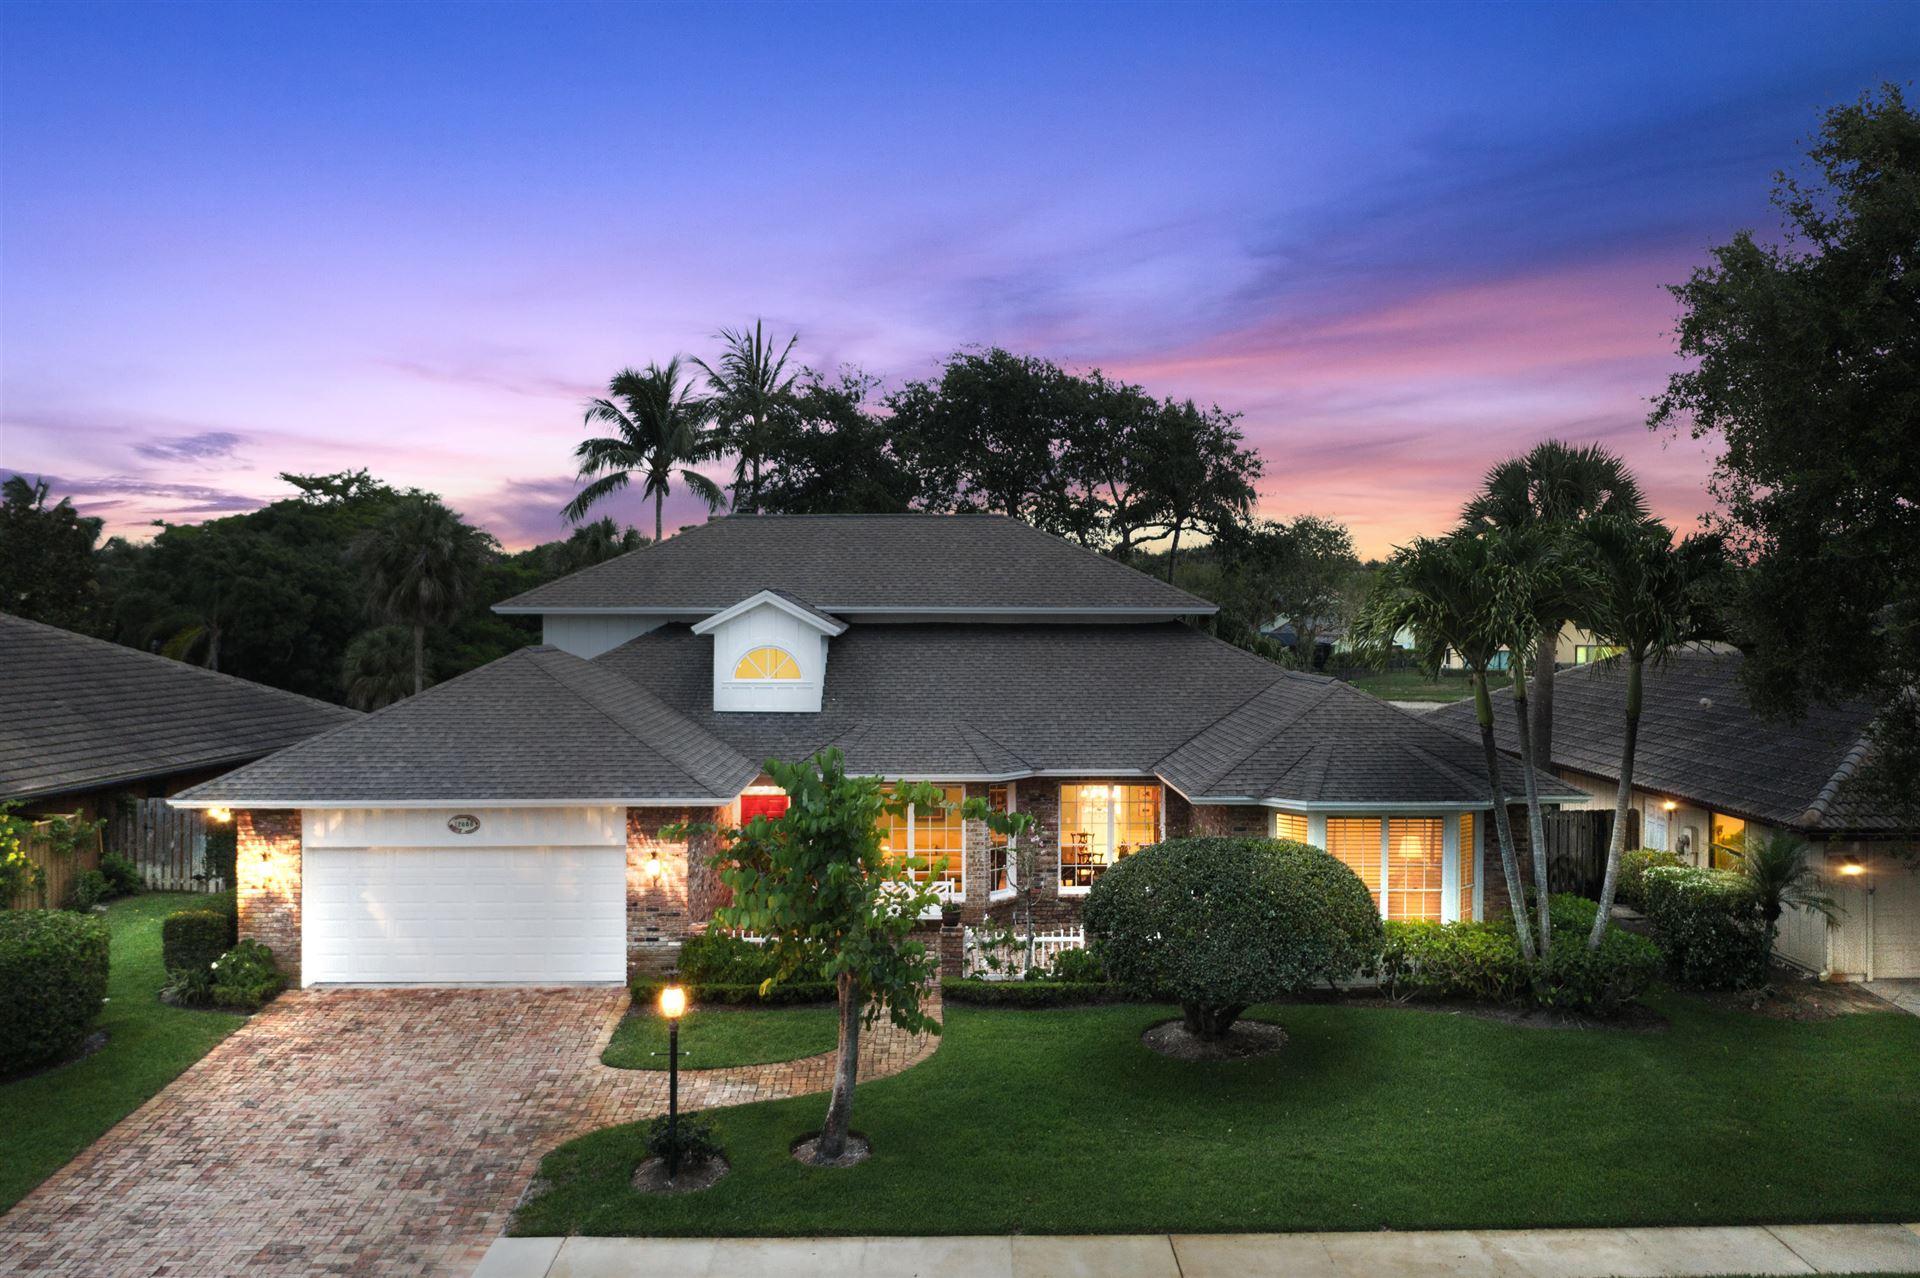 Photo of 12886 La Rochelle Circle, Palm Beach Gardens, FL 33410 (MLS # RX-10726216)